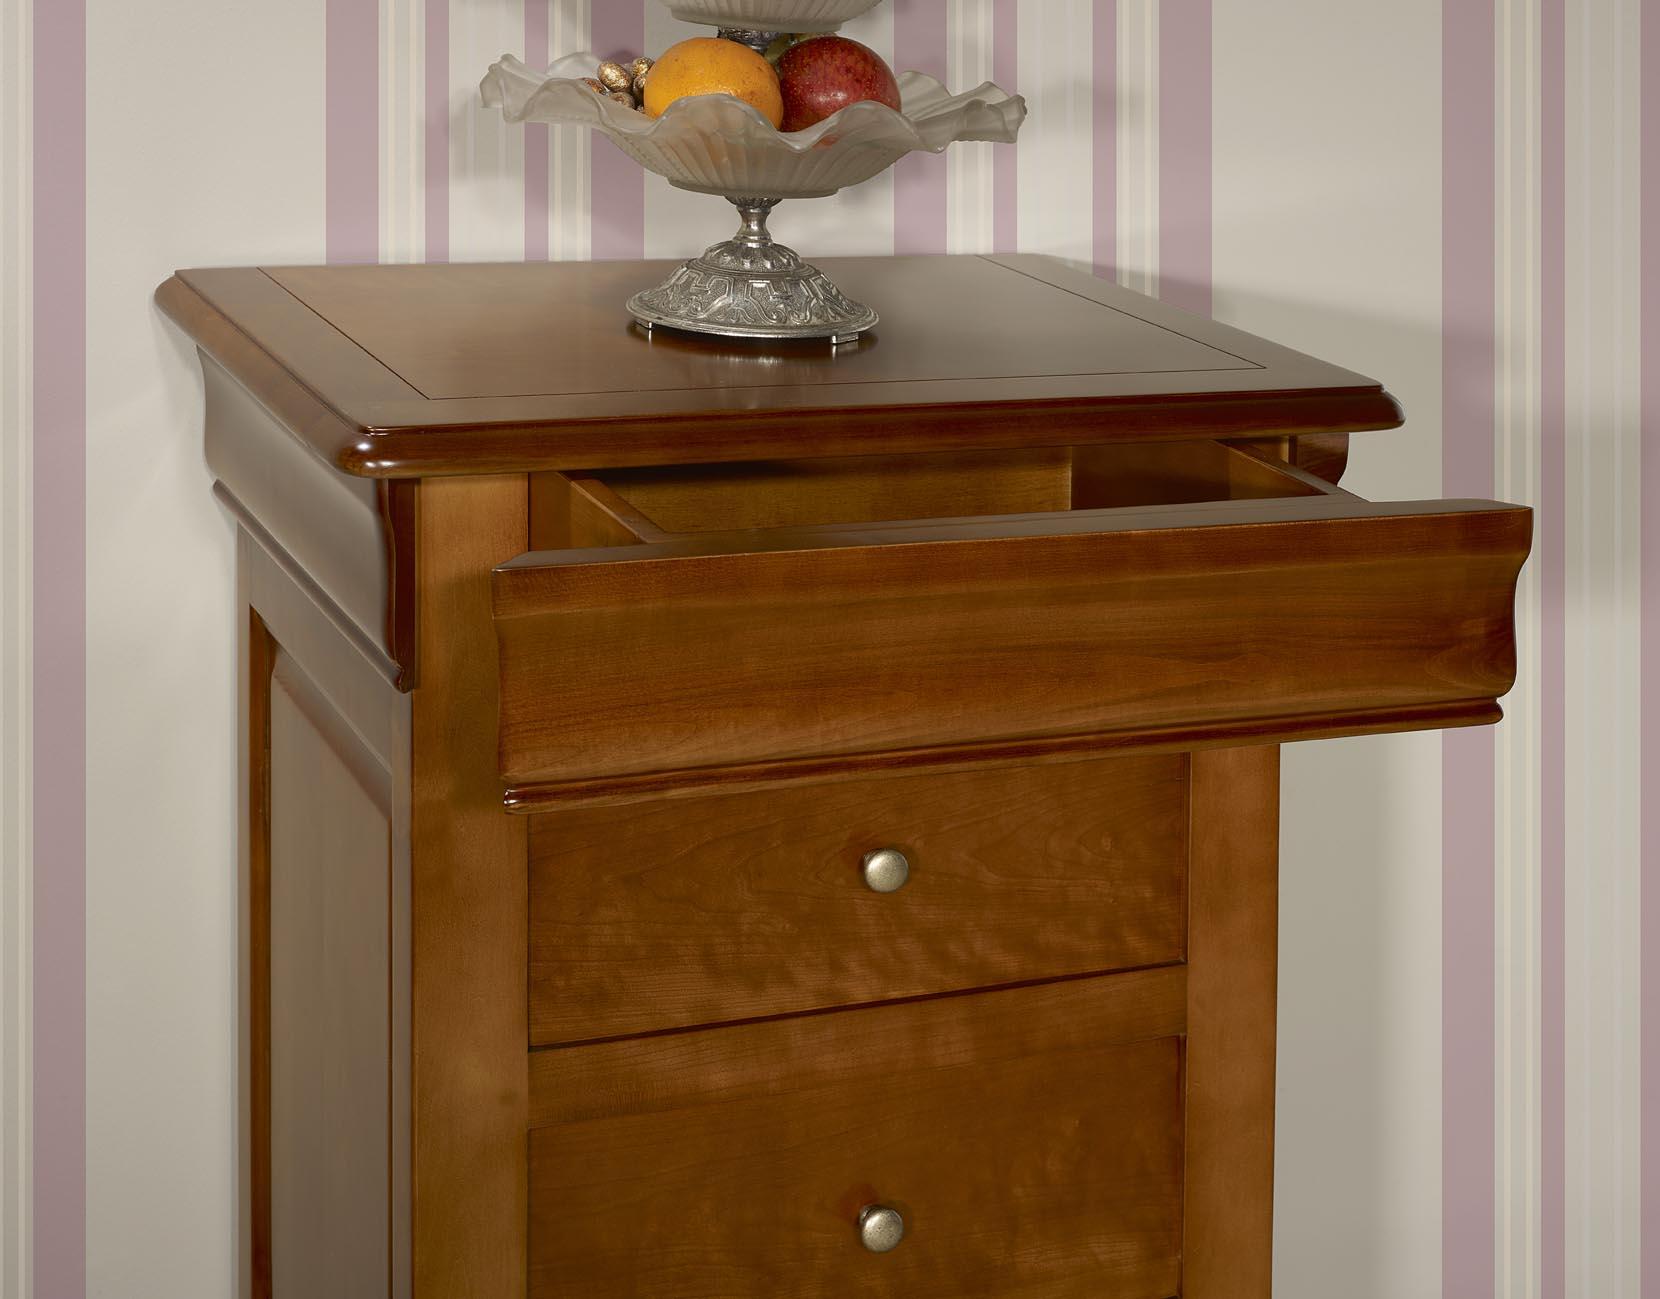 chiffonnier 4 tiroirs en merisier massif de style louis philippe meuble en merisier massif. Black Bedroom Furniture Sets. Home Design Ideas